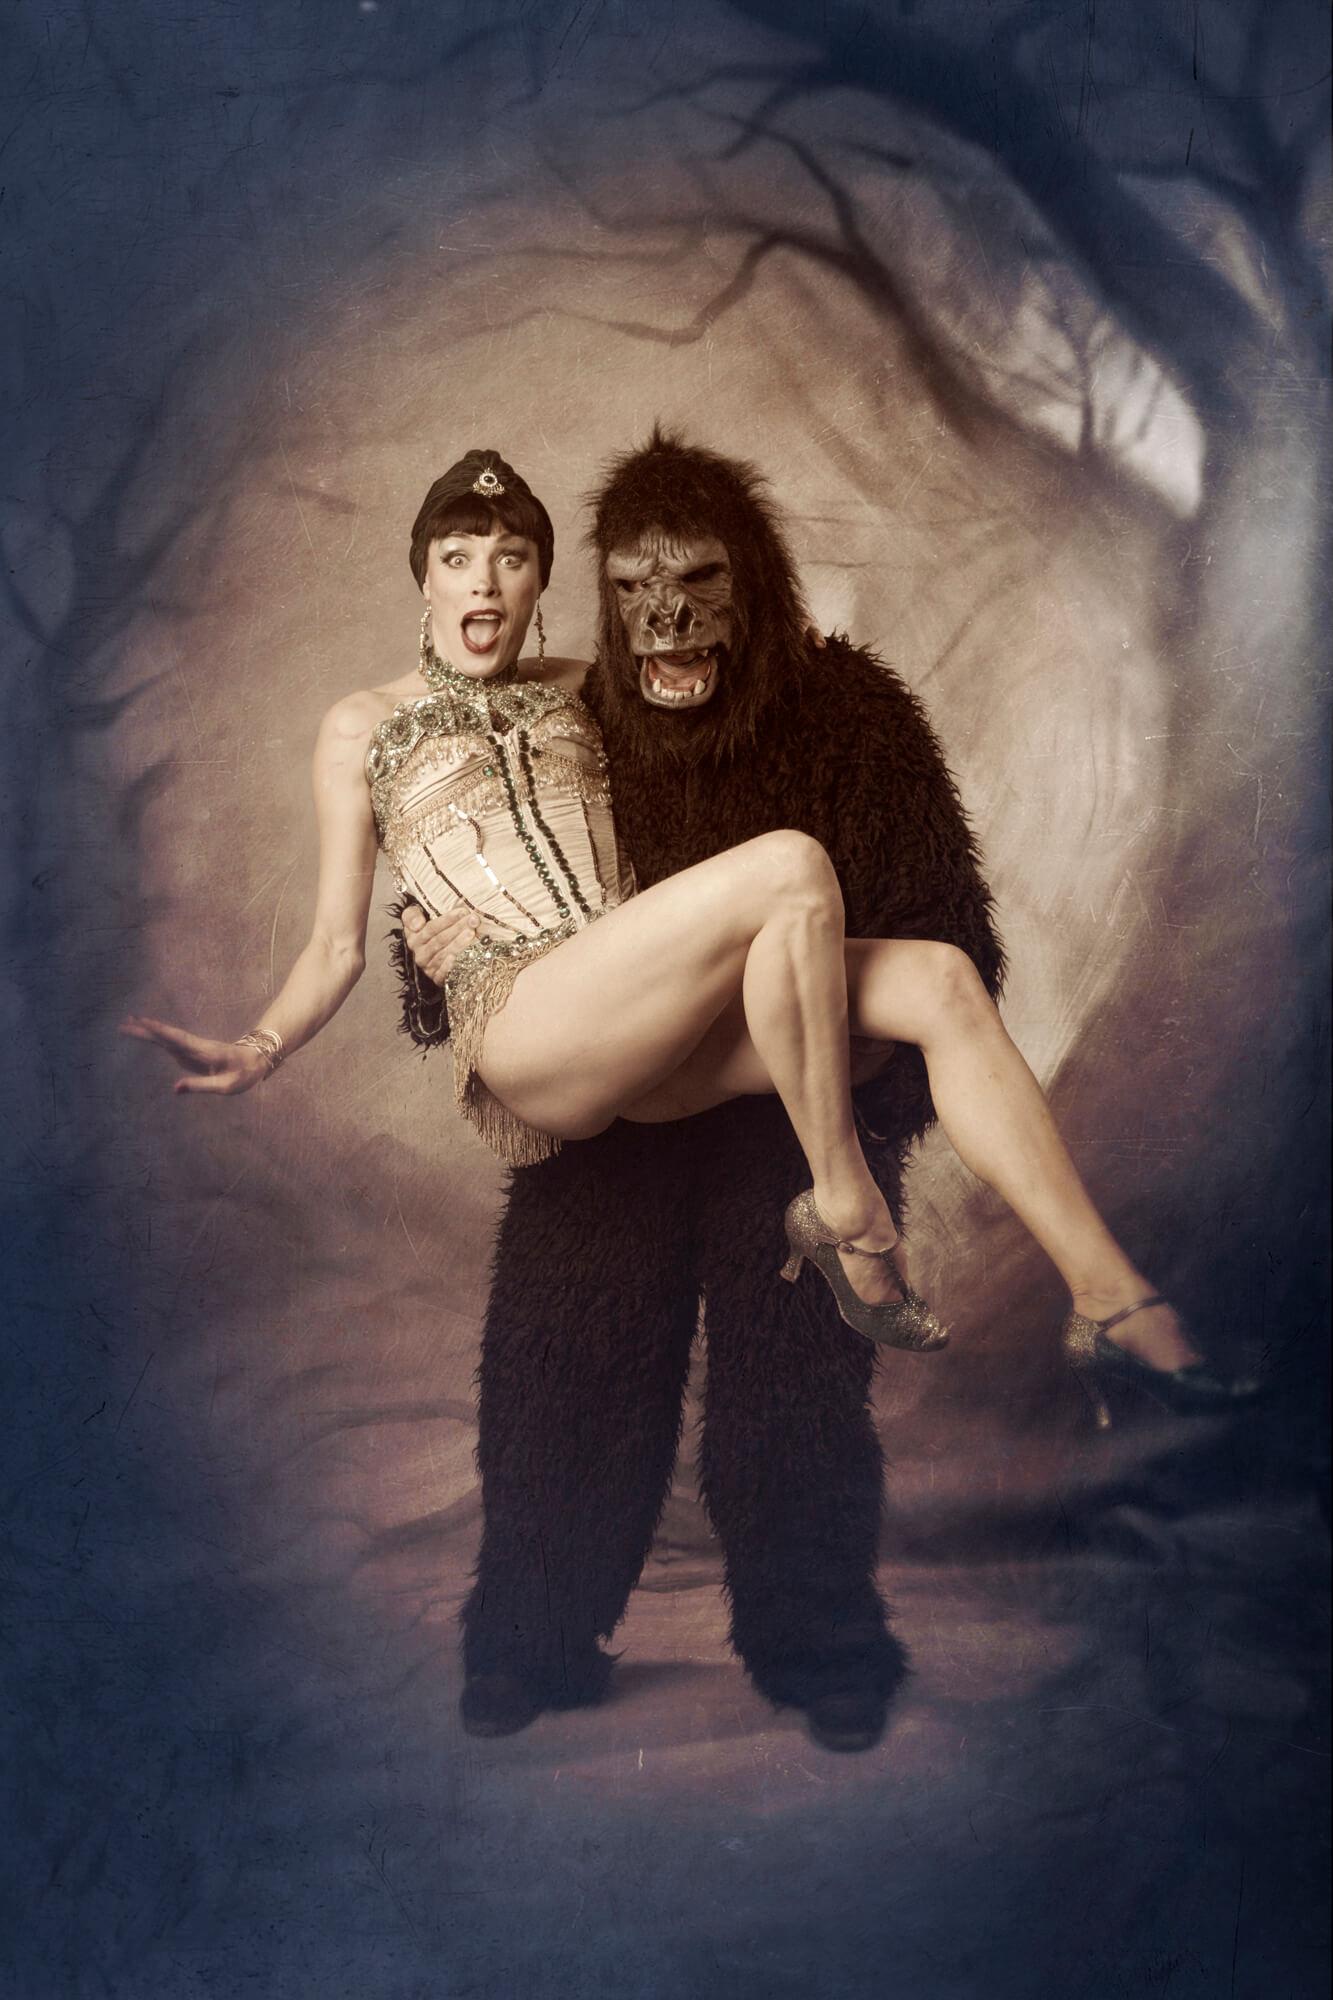 © Showgirl Monkey - Atelieri O Haapala